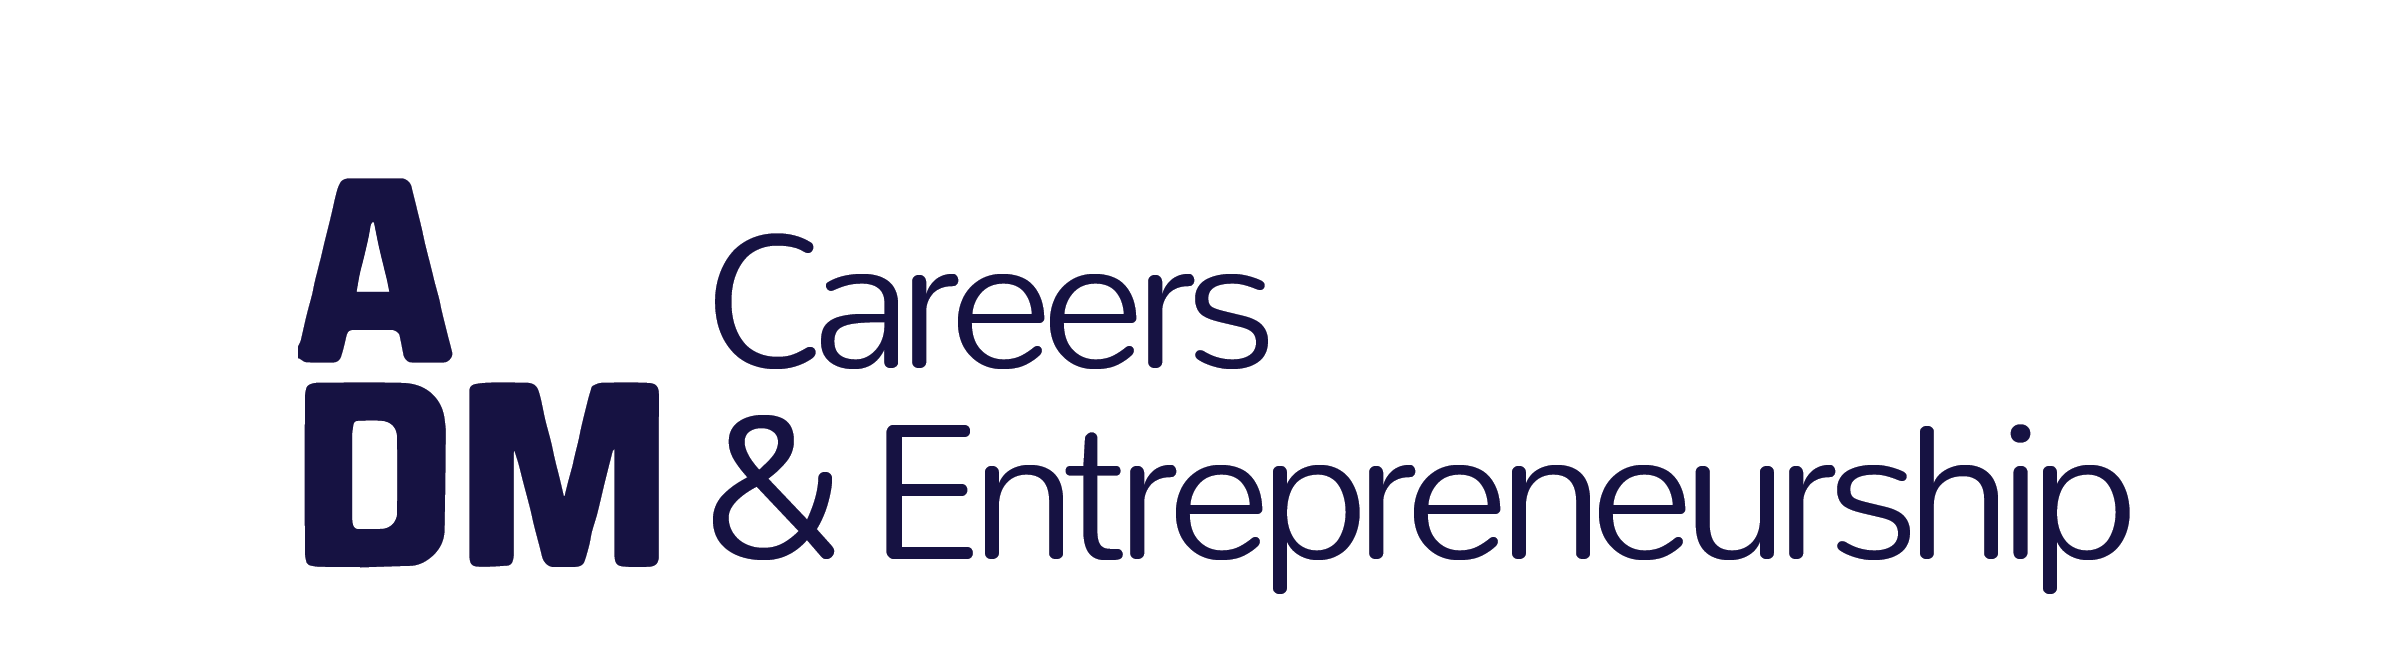 ADM Careers and Entrepreneurship